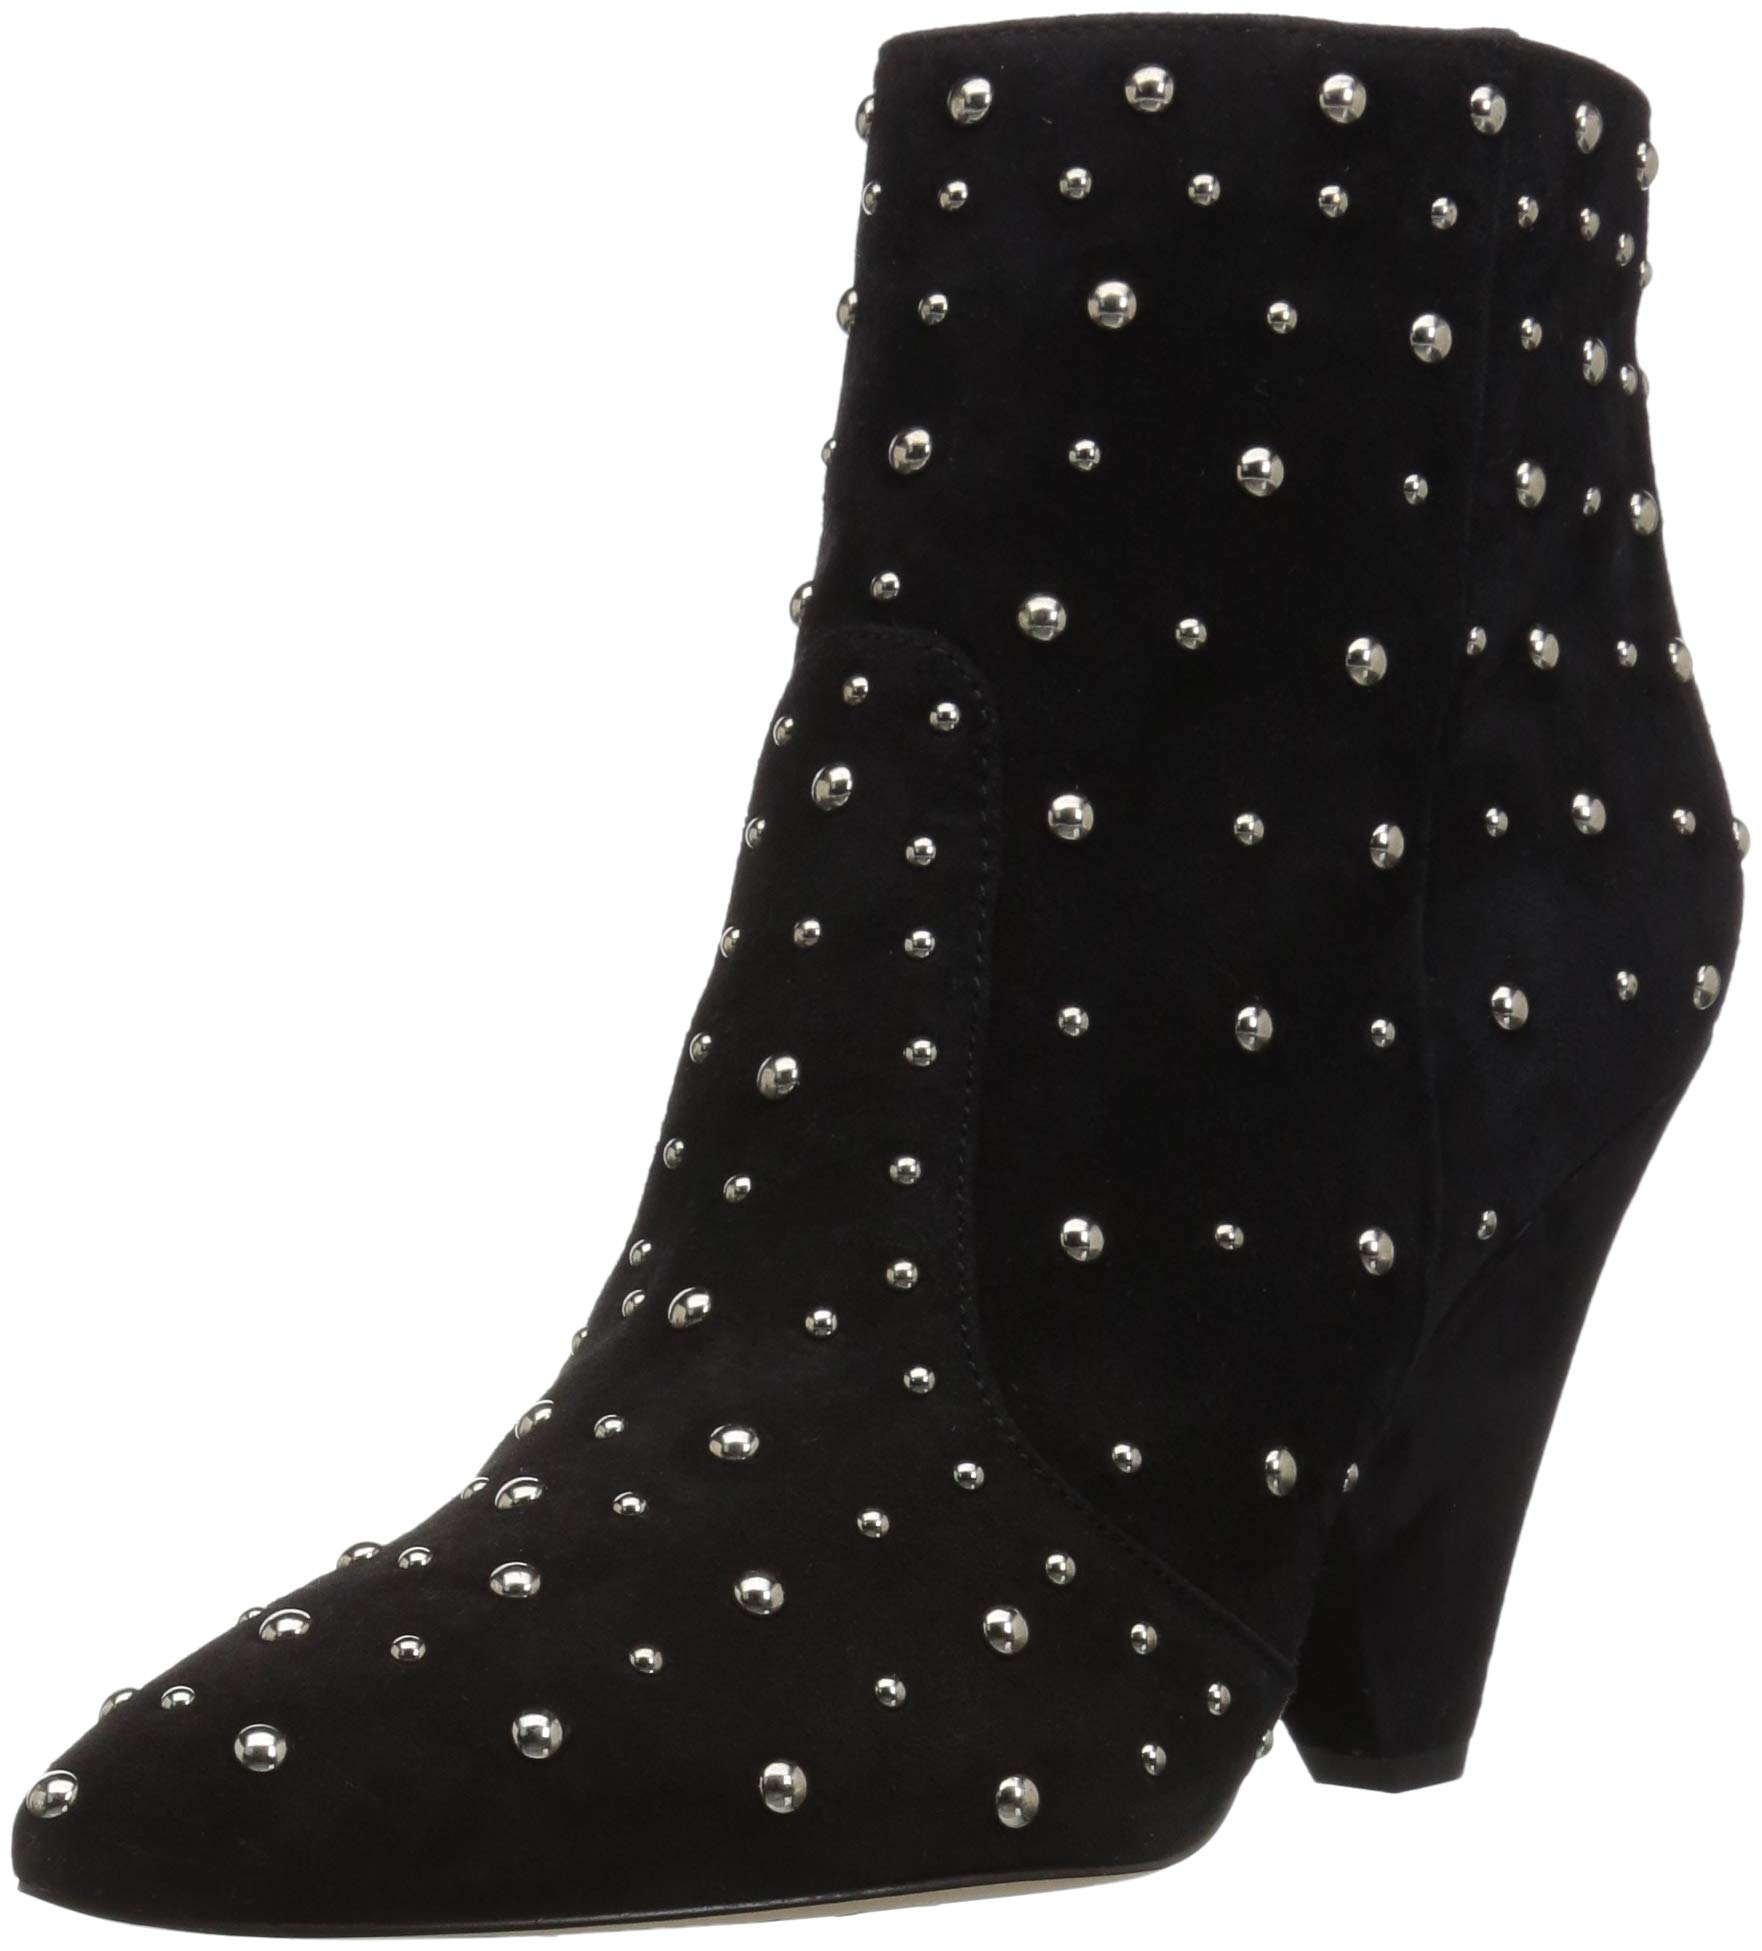 Sam Edelman Women's Roya Fashion Boot, Black Suede, 8.5 M US by Sam Edelman